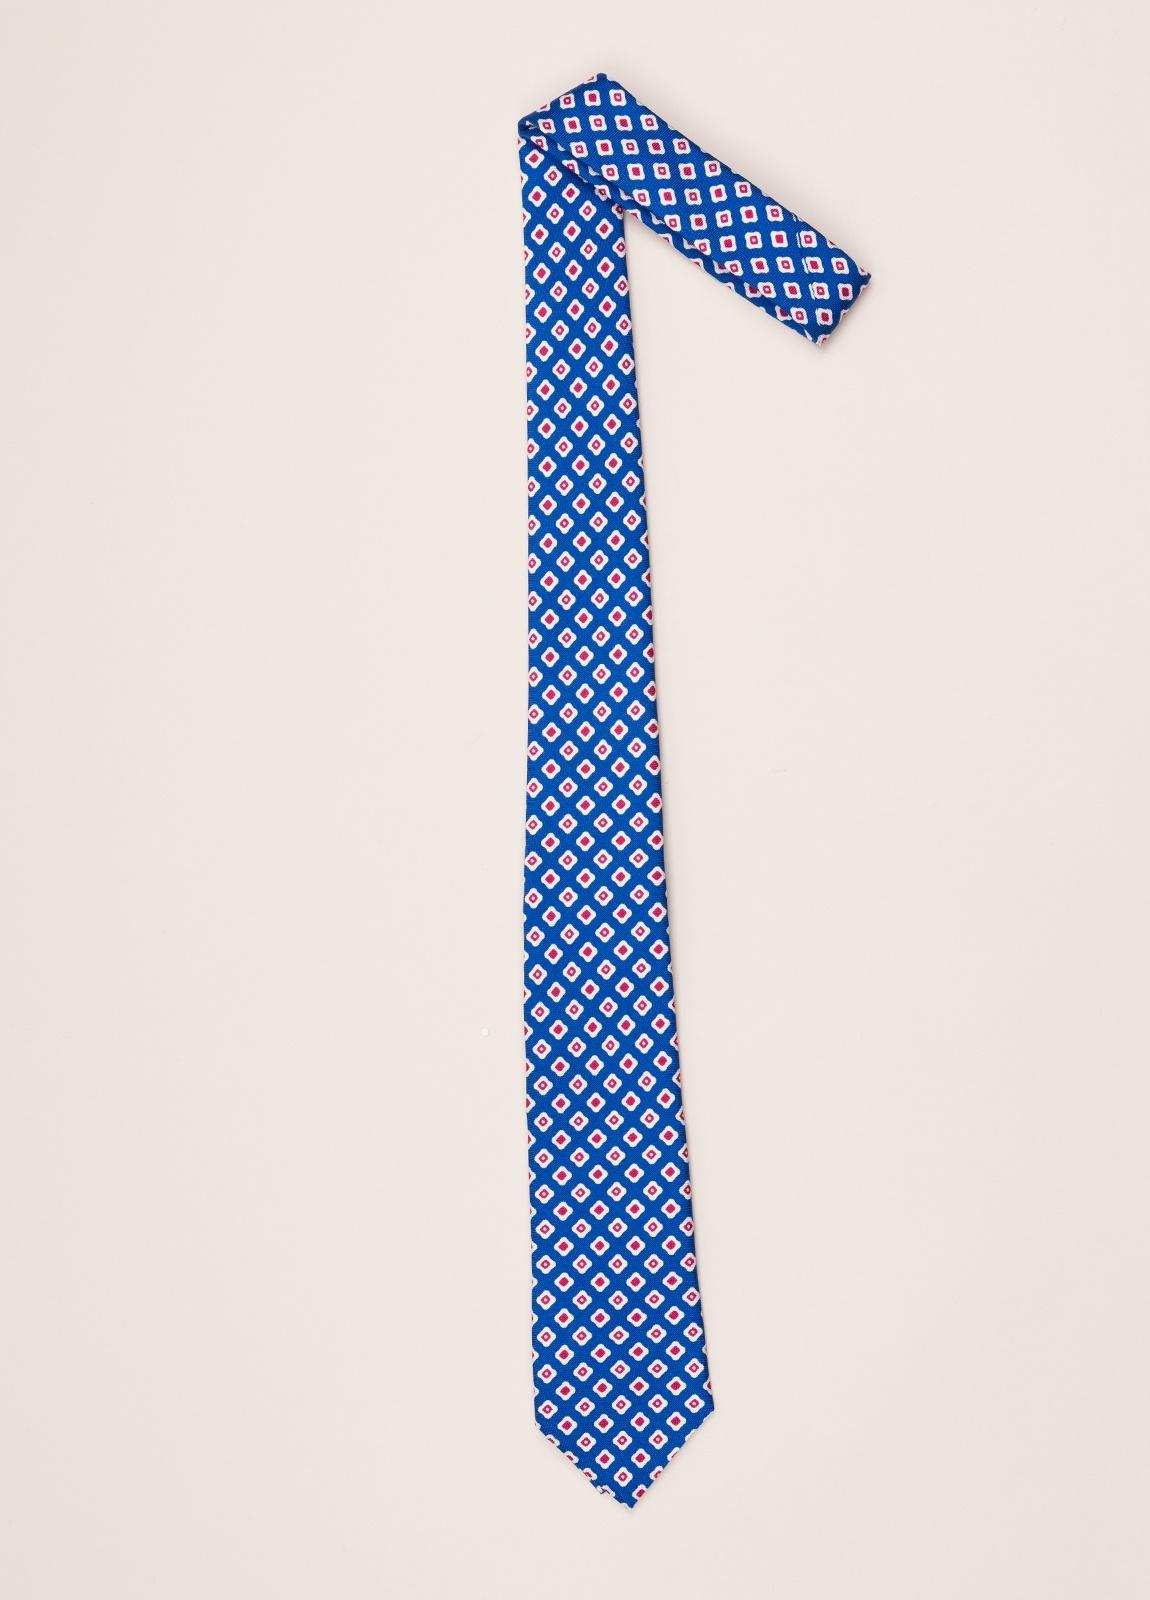 Corbata FUREST COLECCIÓN azul dibujo - Ítem1